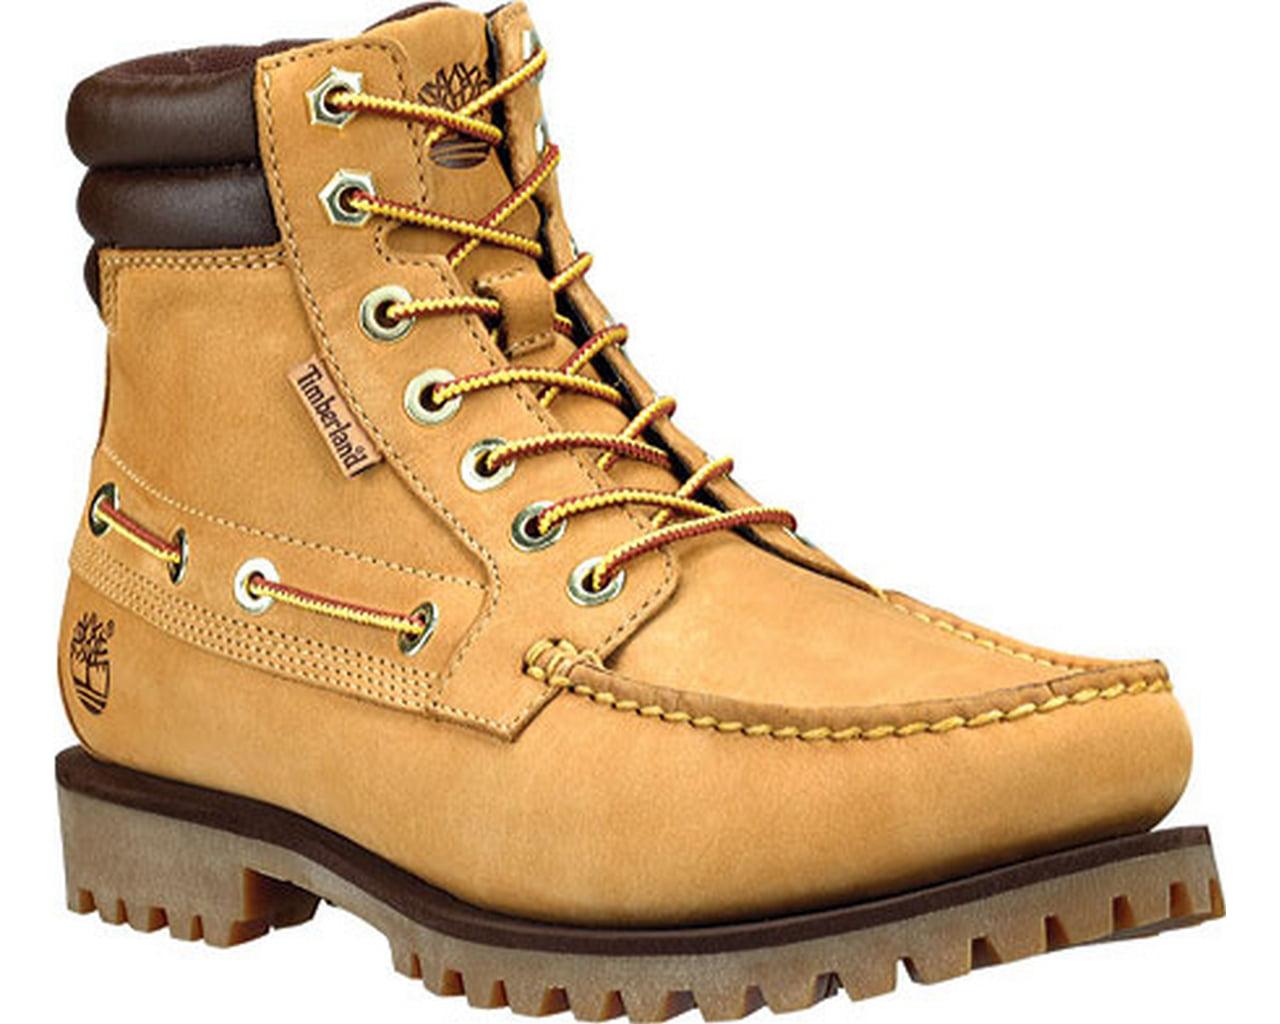 Timberland 7-Eye Moc Toe Wheat Men's Boots 72540 by Timberland